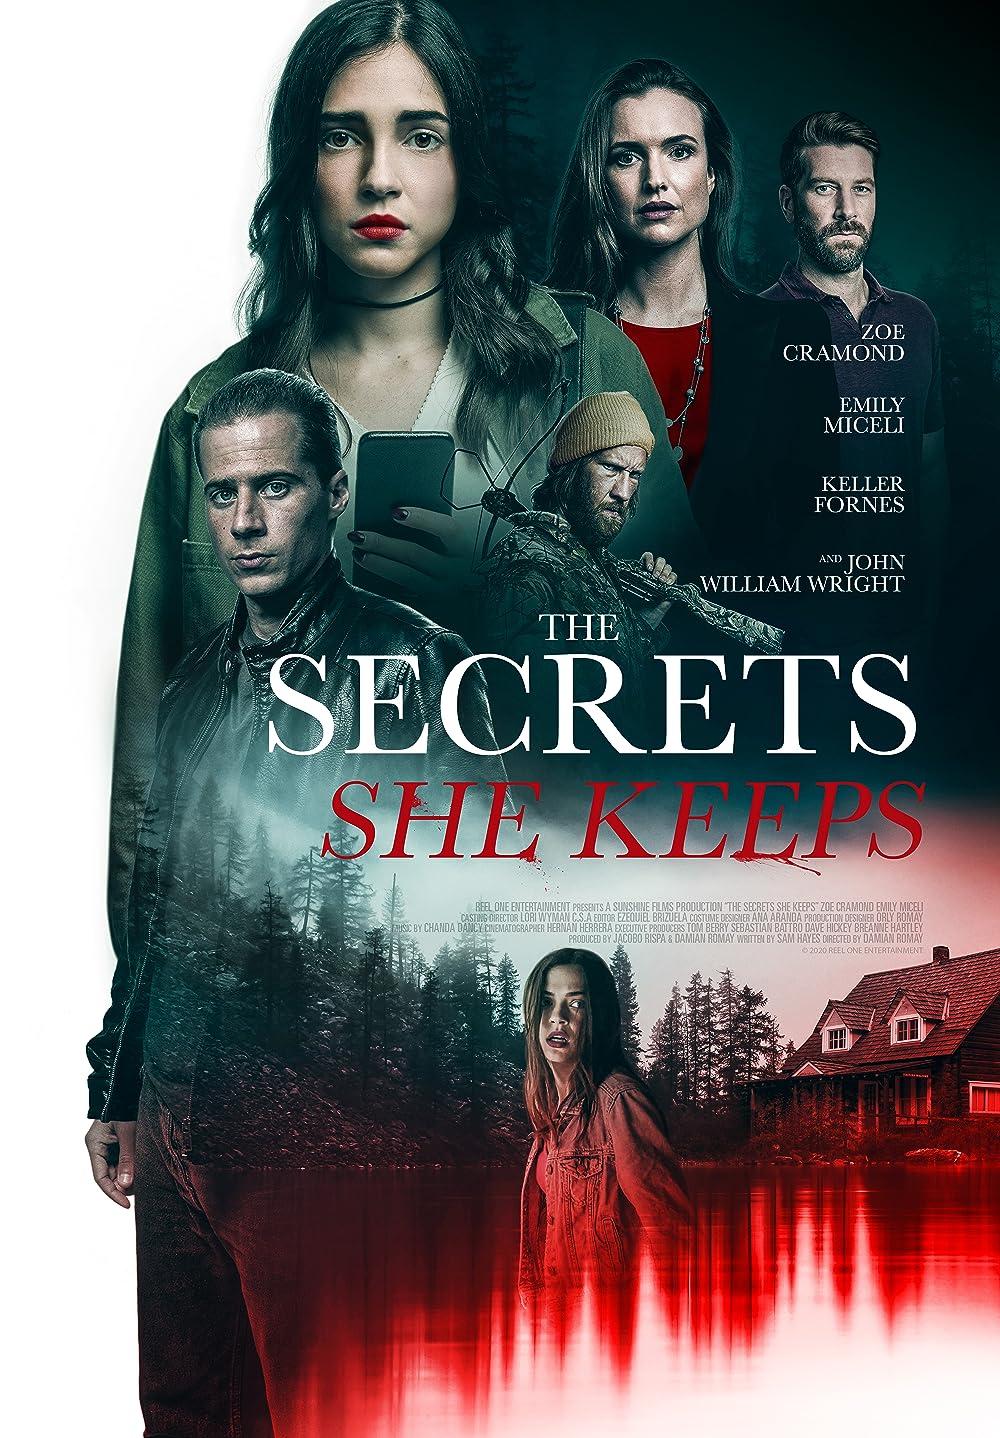 The Secrets She Keeps 2021 English 720p HDRip 800MB Download